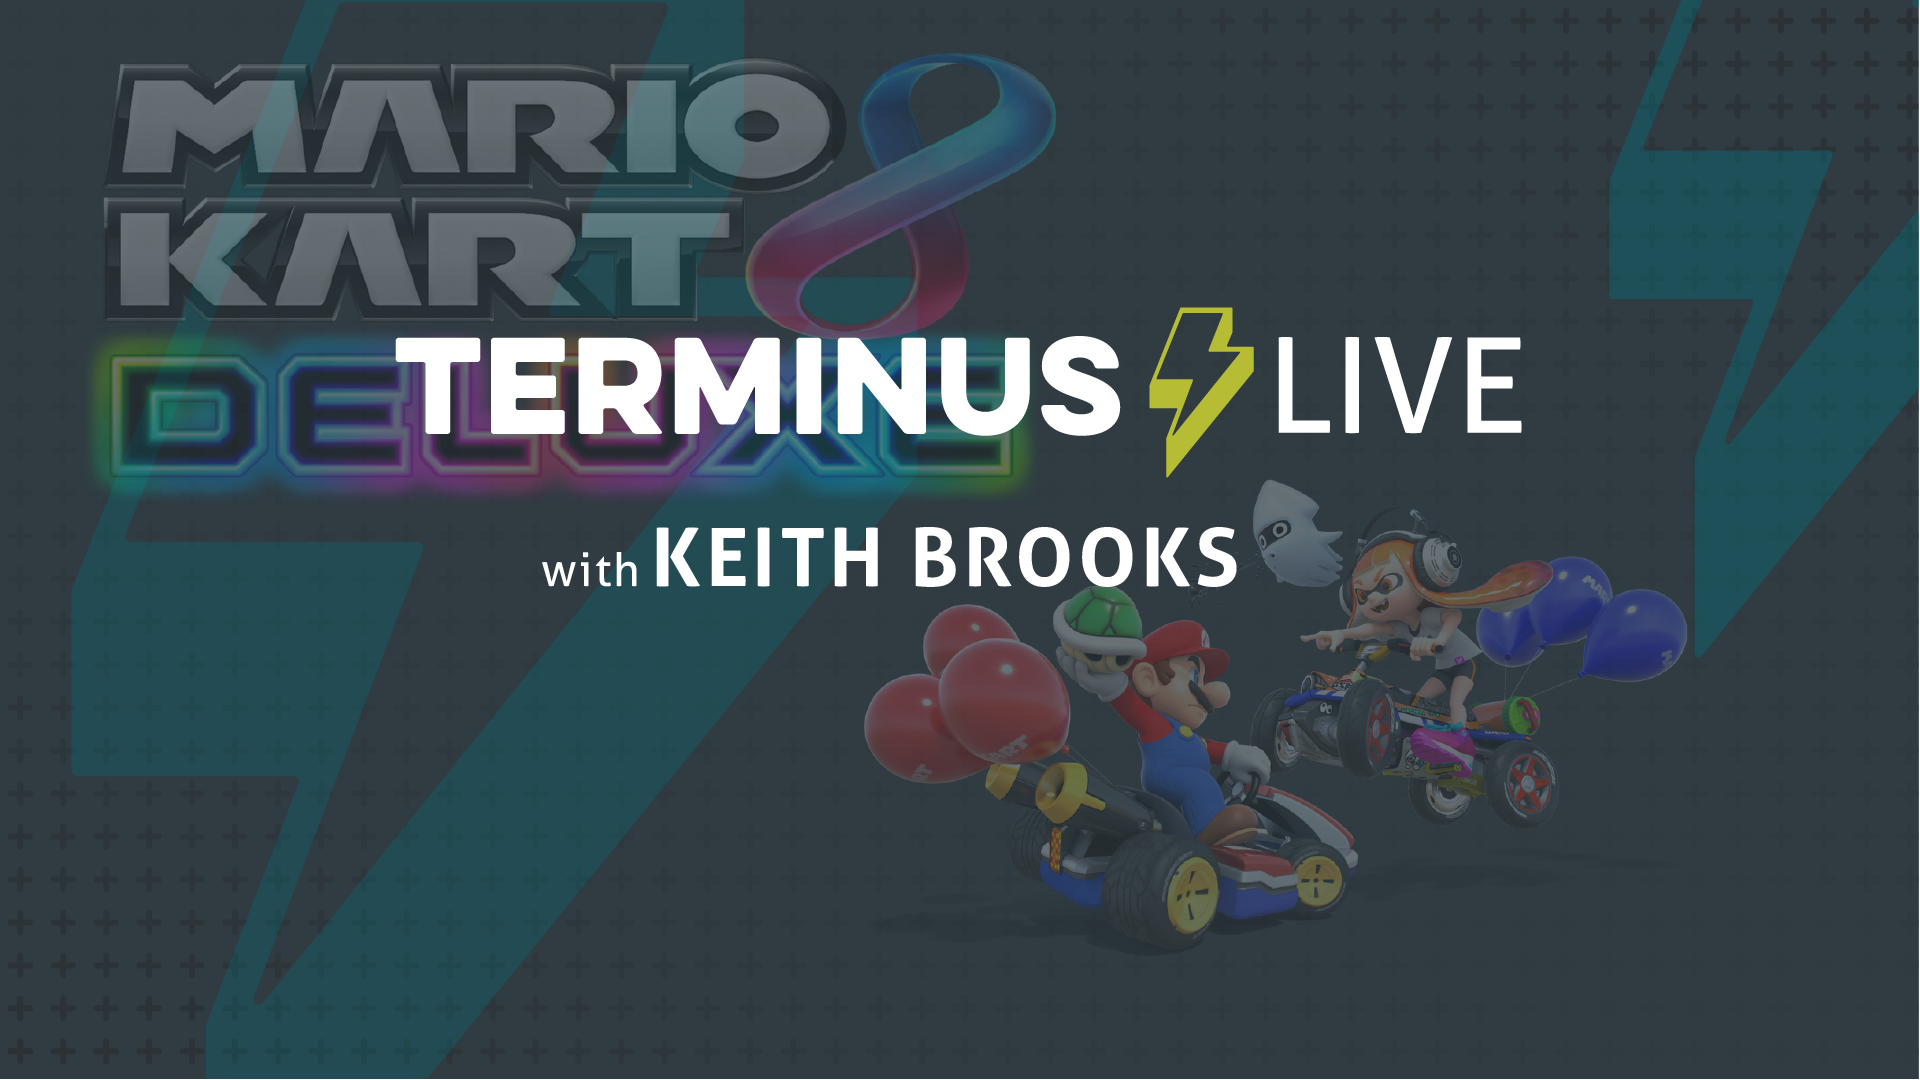 TERMINUS Live: Keith Brooks plays Mario Kart